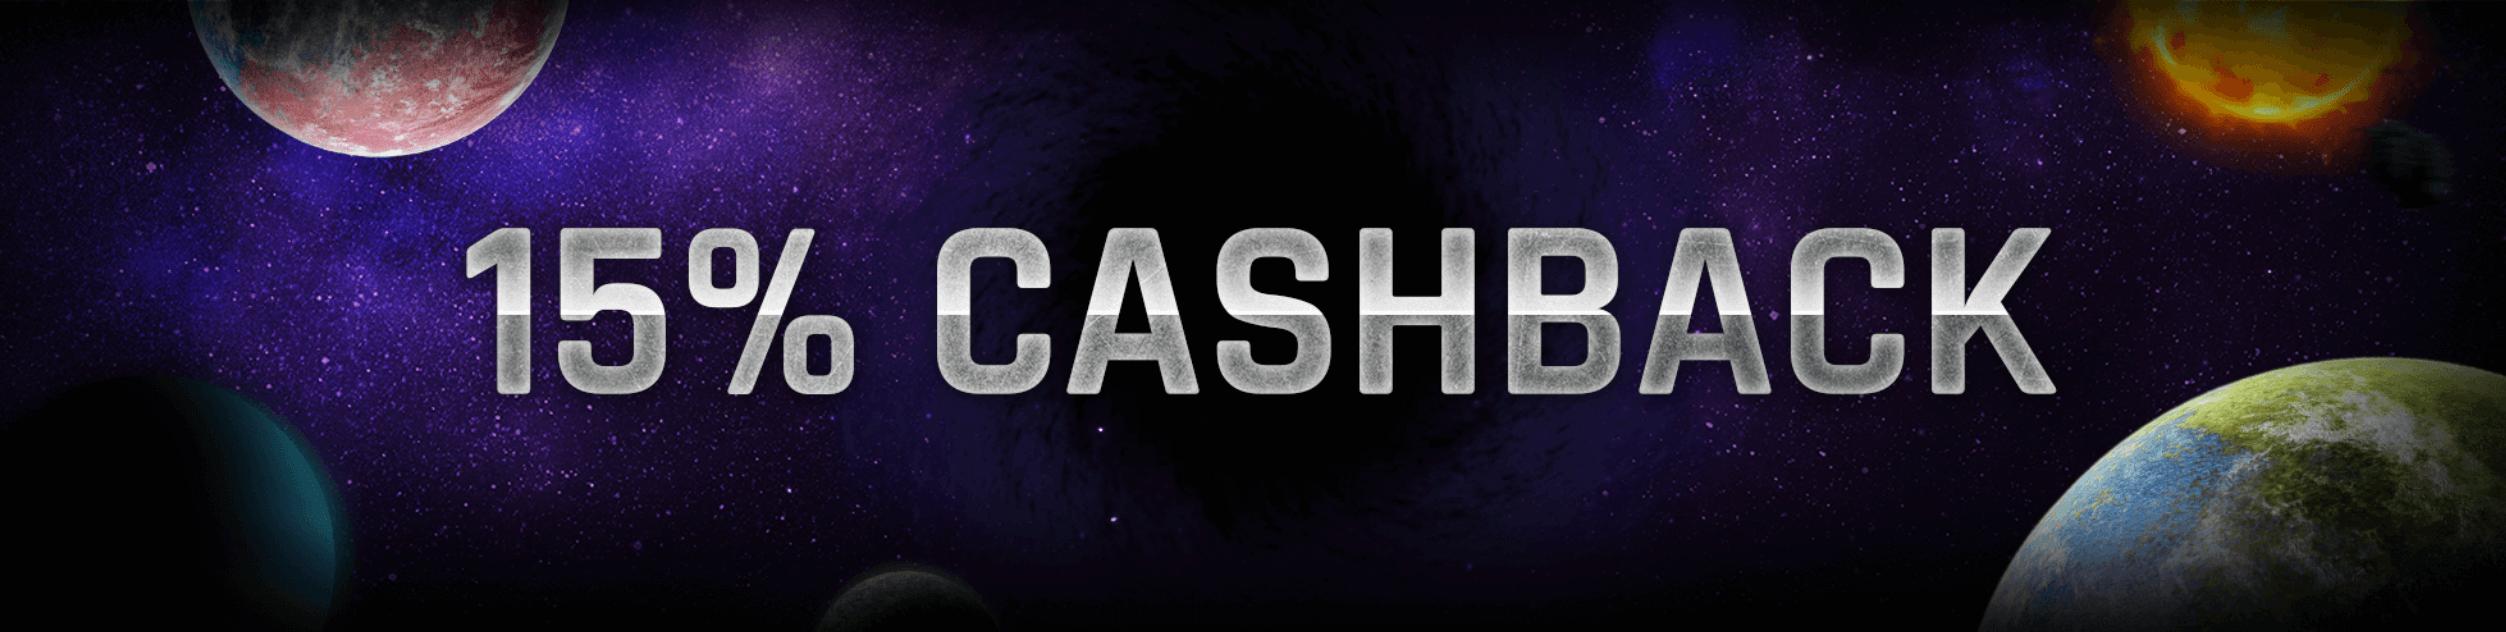 casinouniverse 15% cashback bonus joka viikko